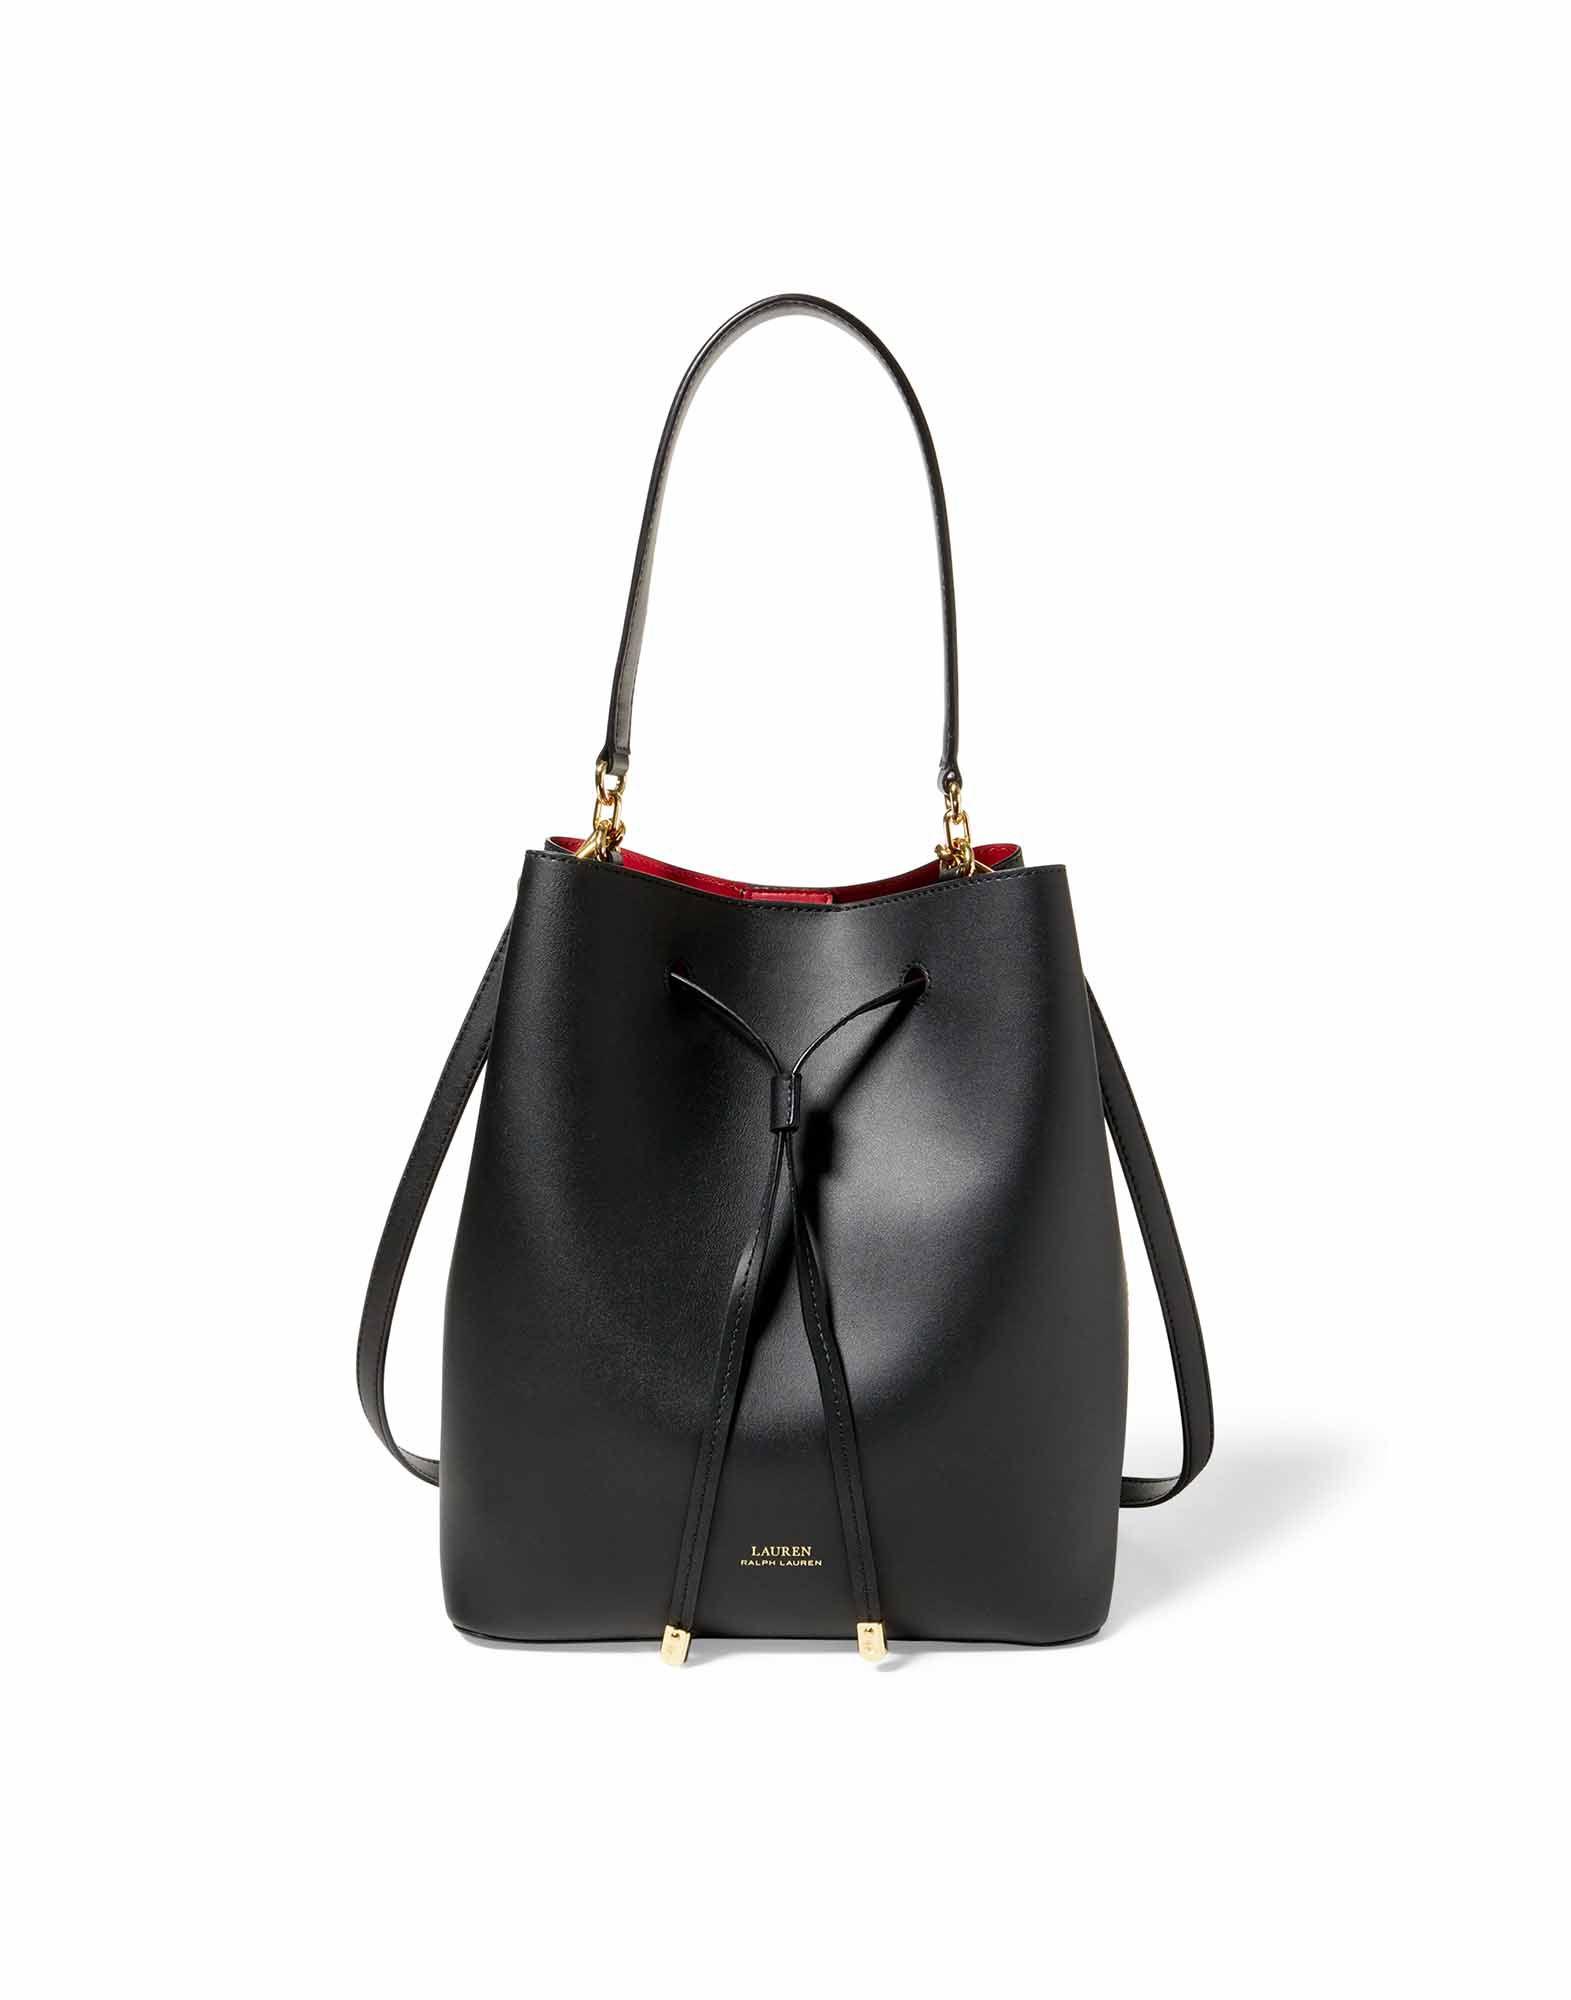 769902343fde Lauren Ralph Lauren Smooth Leather Drawstring - Handbag - Women Lauren  Ralph Lauren Handbags online on YOOX United Kingdom - 45400028